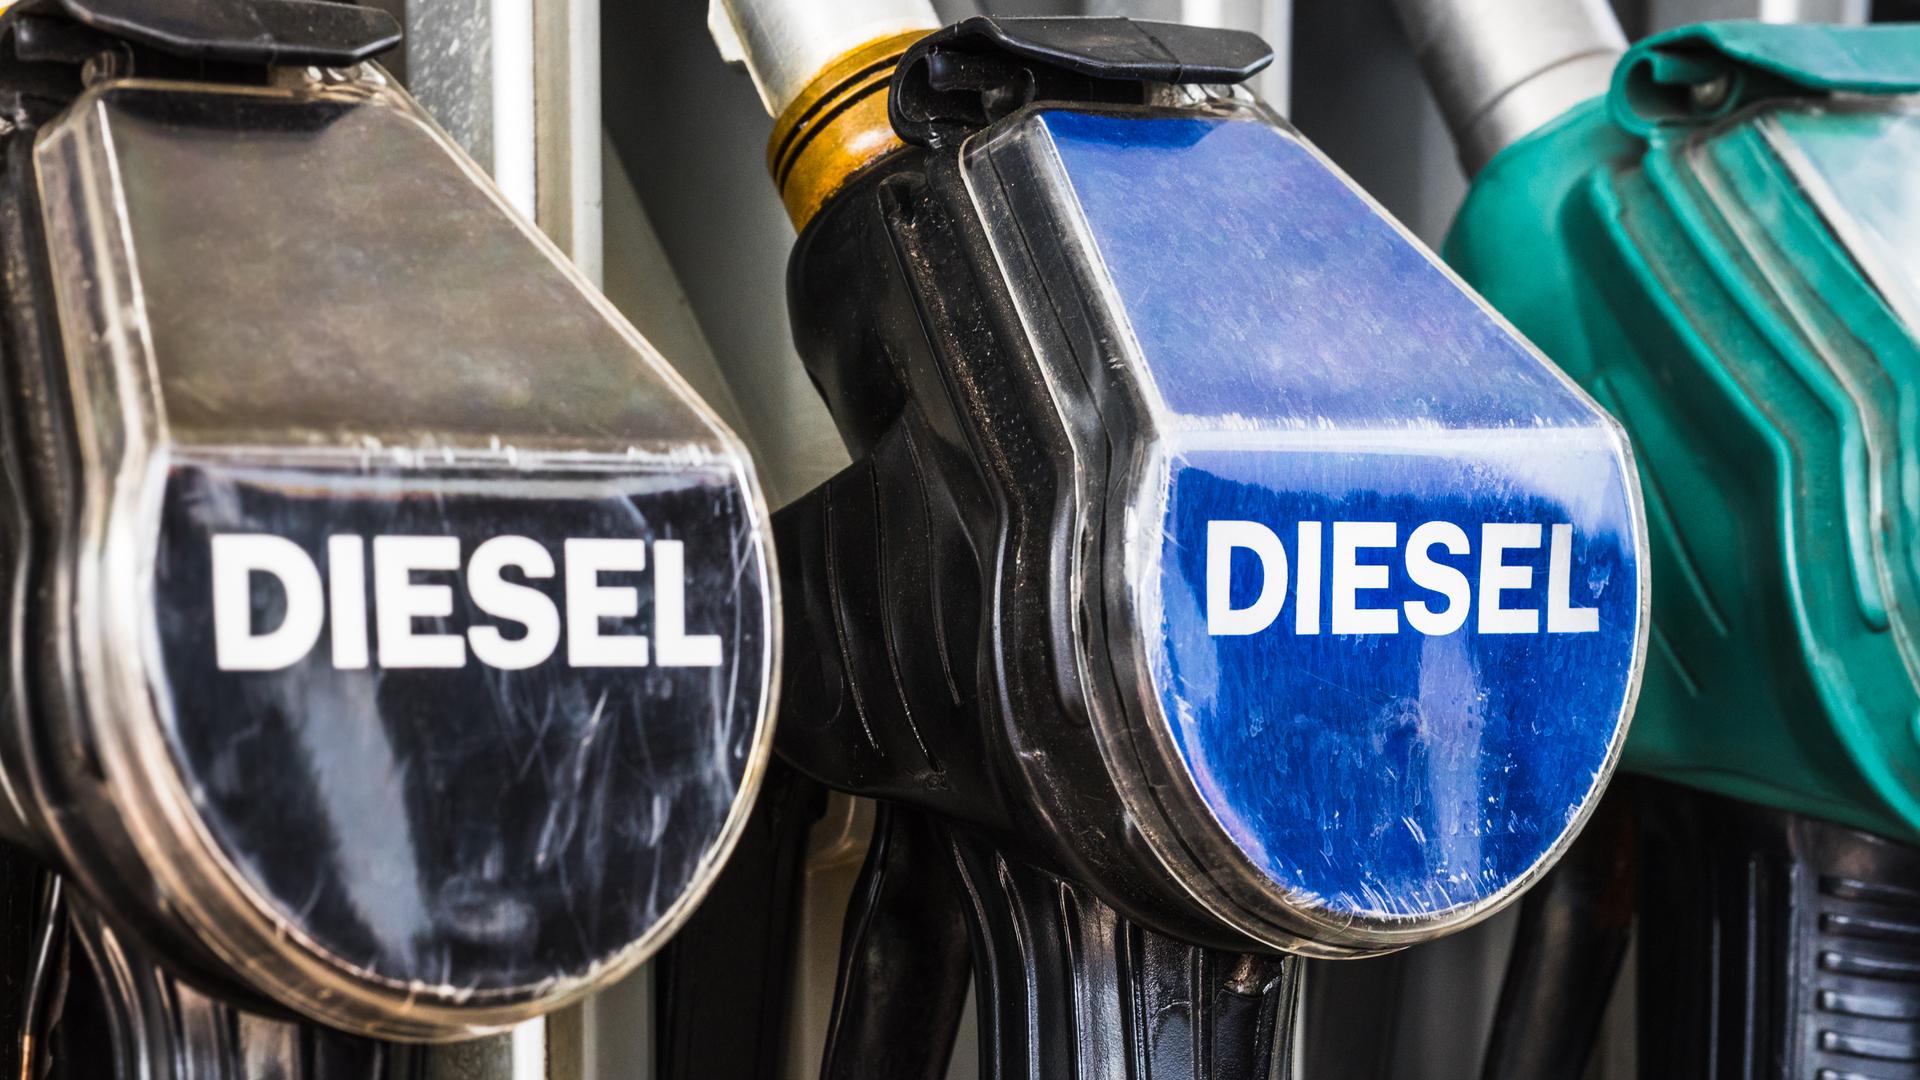 bomba combustivel mangueira abastecer diesel posto